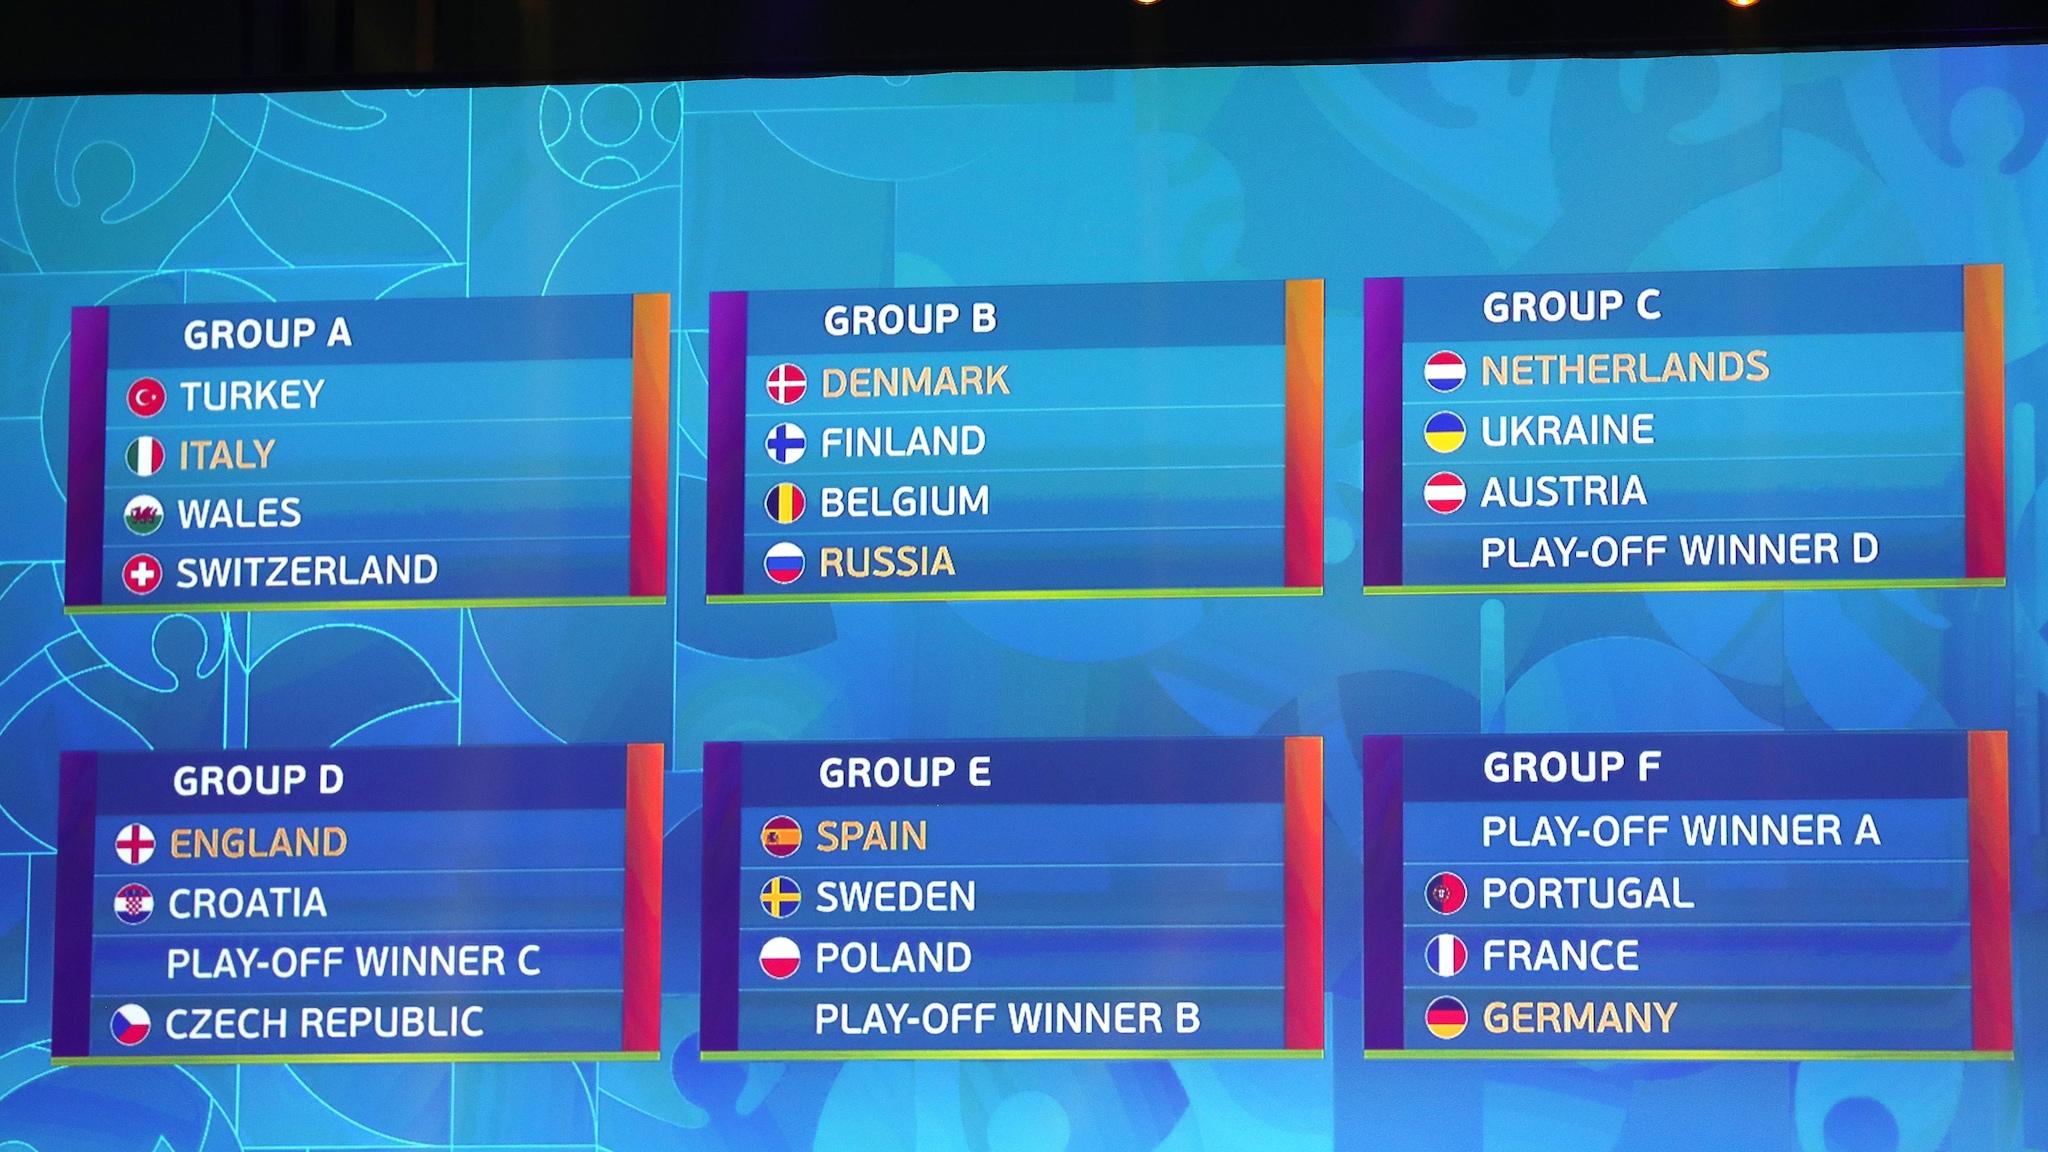 Calendrier Coupe Du Monde Foot Feminin 2021 Le calendrier des matches de l'UEFA EURO 2020 | UEFA EURO 2020